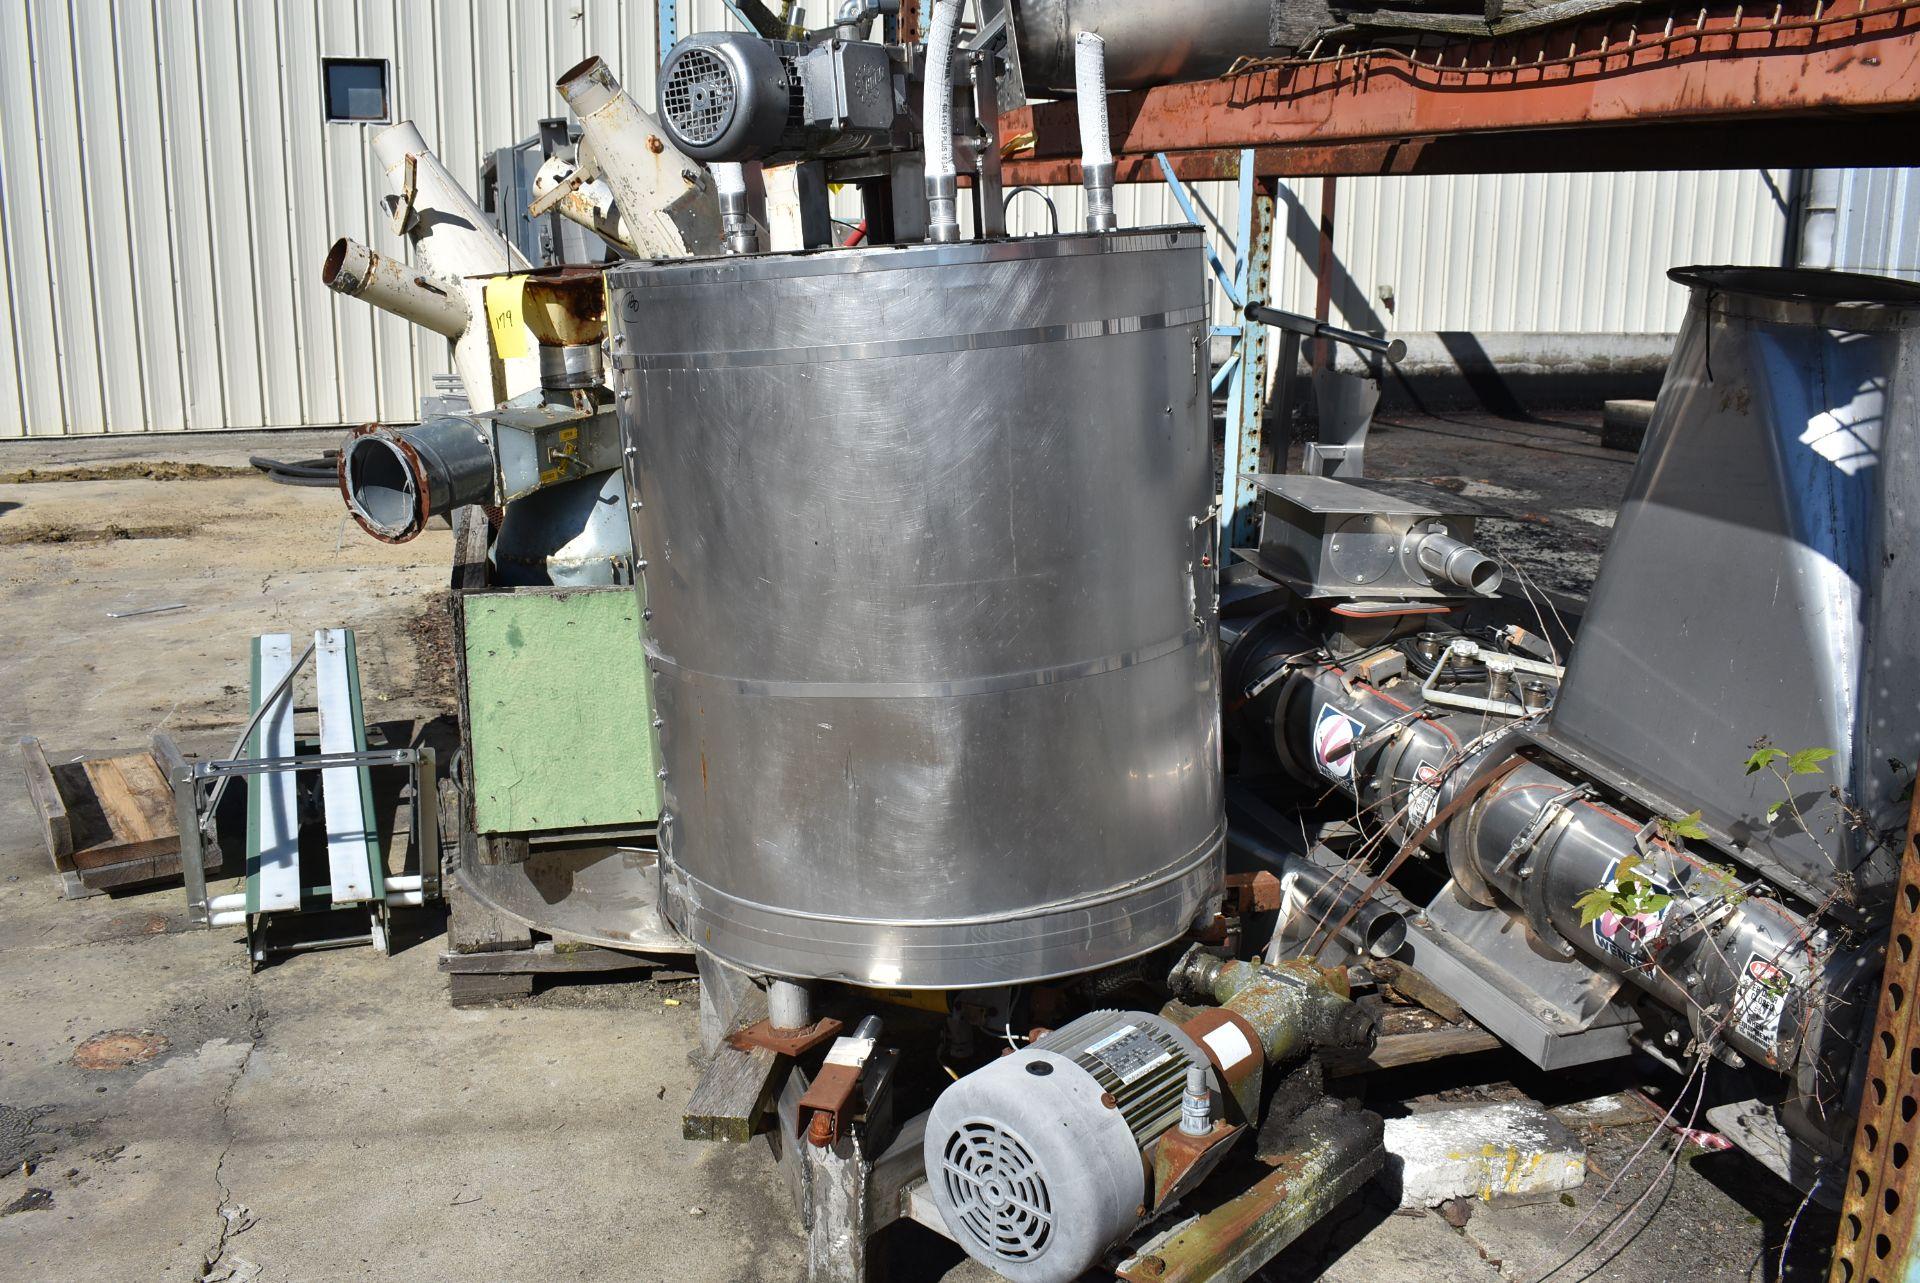 "Stainless Steel Tank, 30"" Diameter x 36"" Top - Flat Bottom, 3 HP Motor & Pump, Includes Mixer"